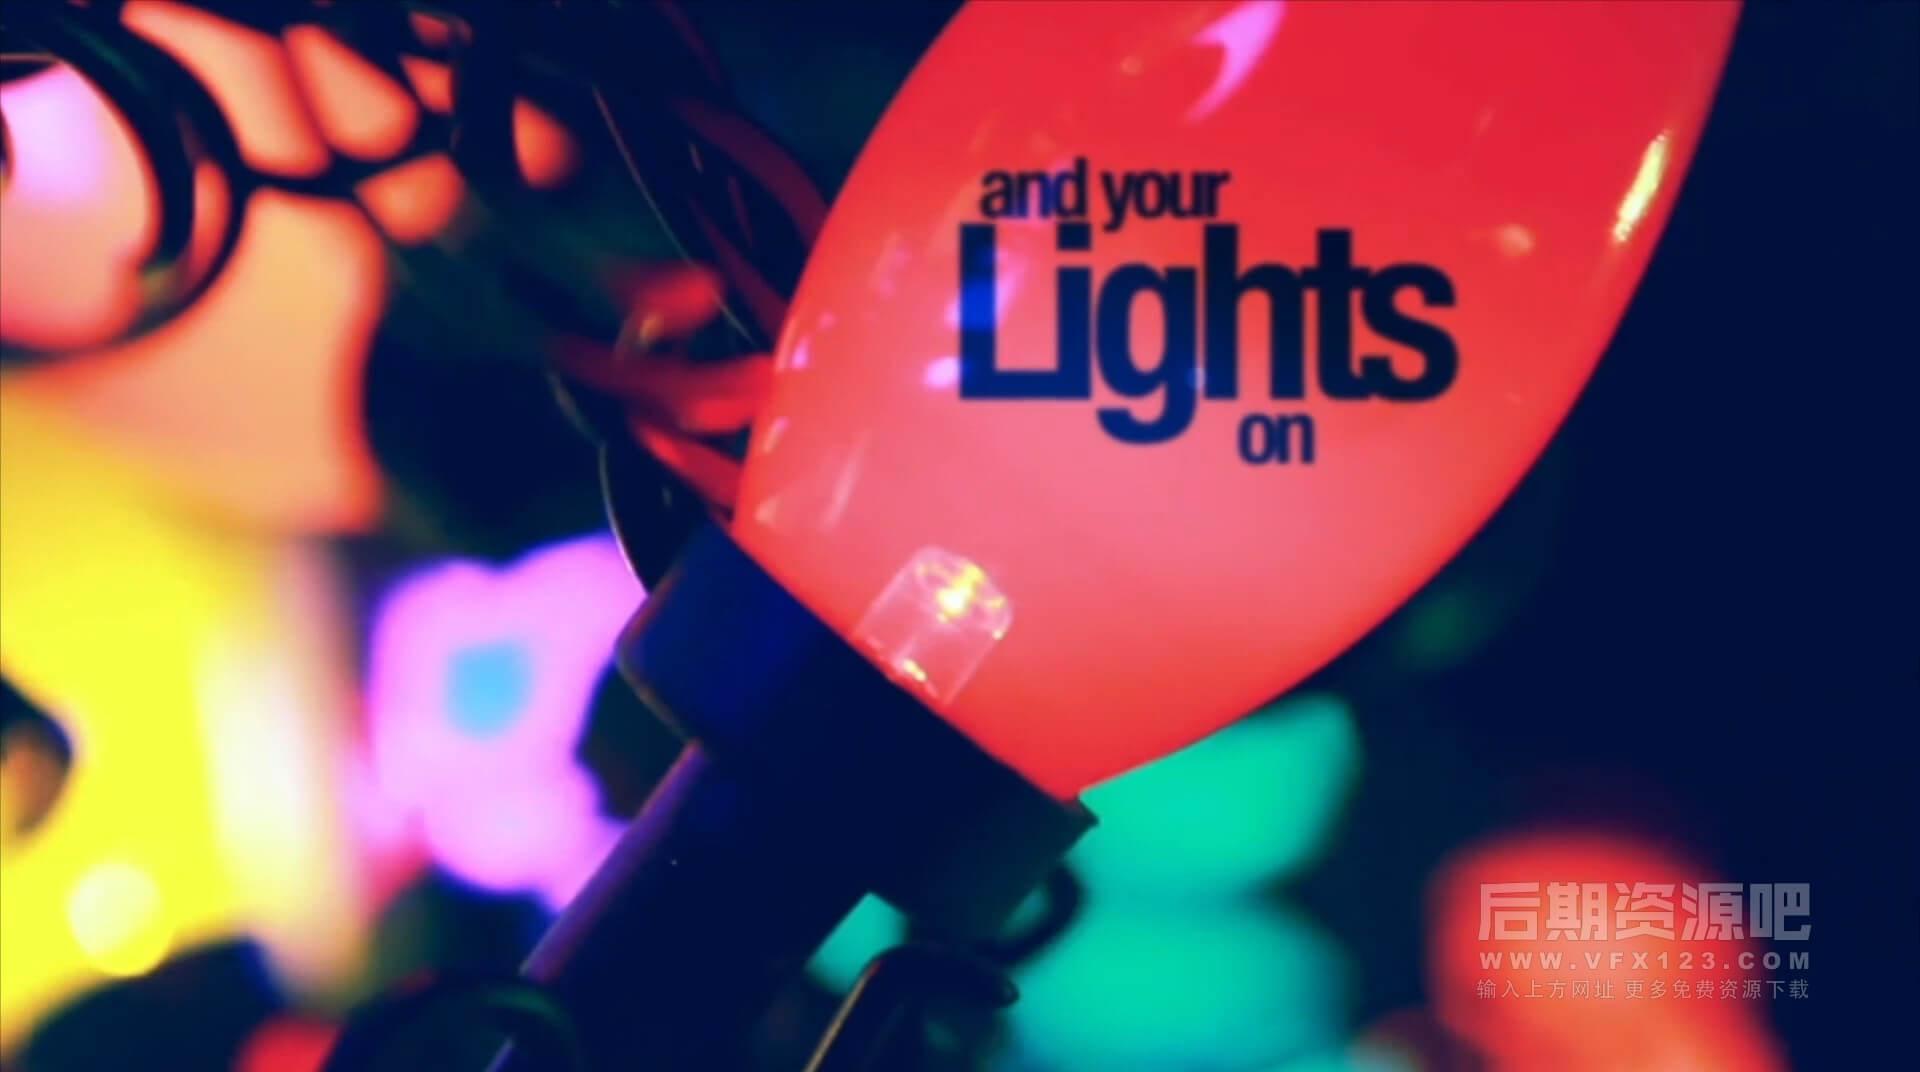 Motion模板 霓虹灯假日聚会节日开场 Holidays Lights